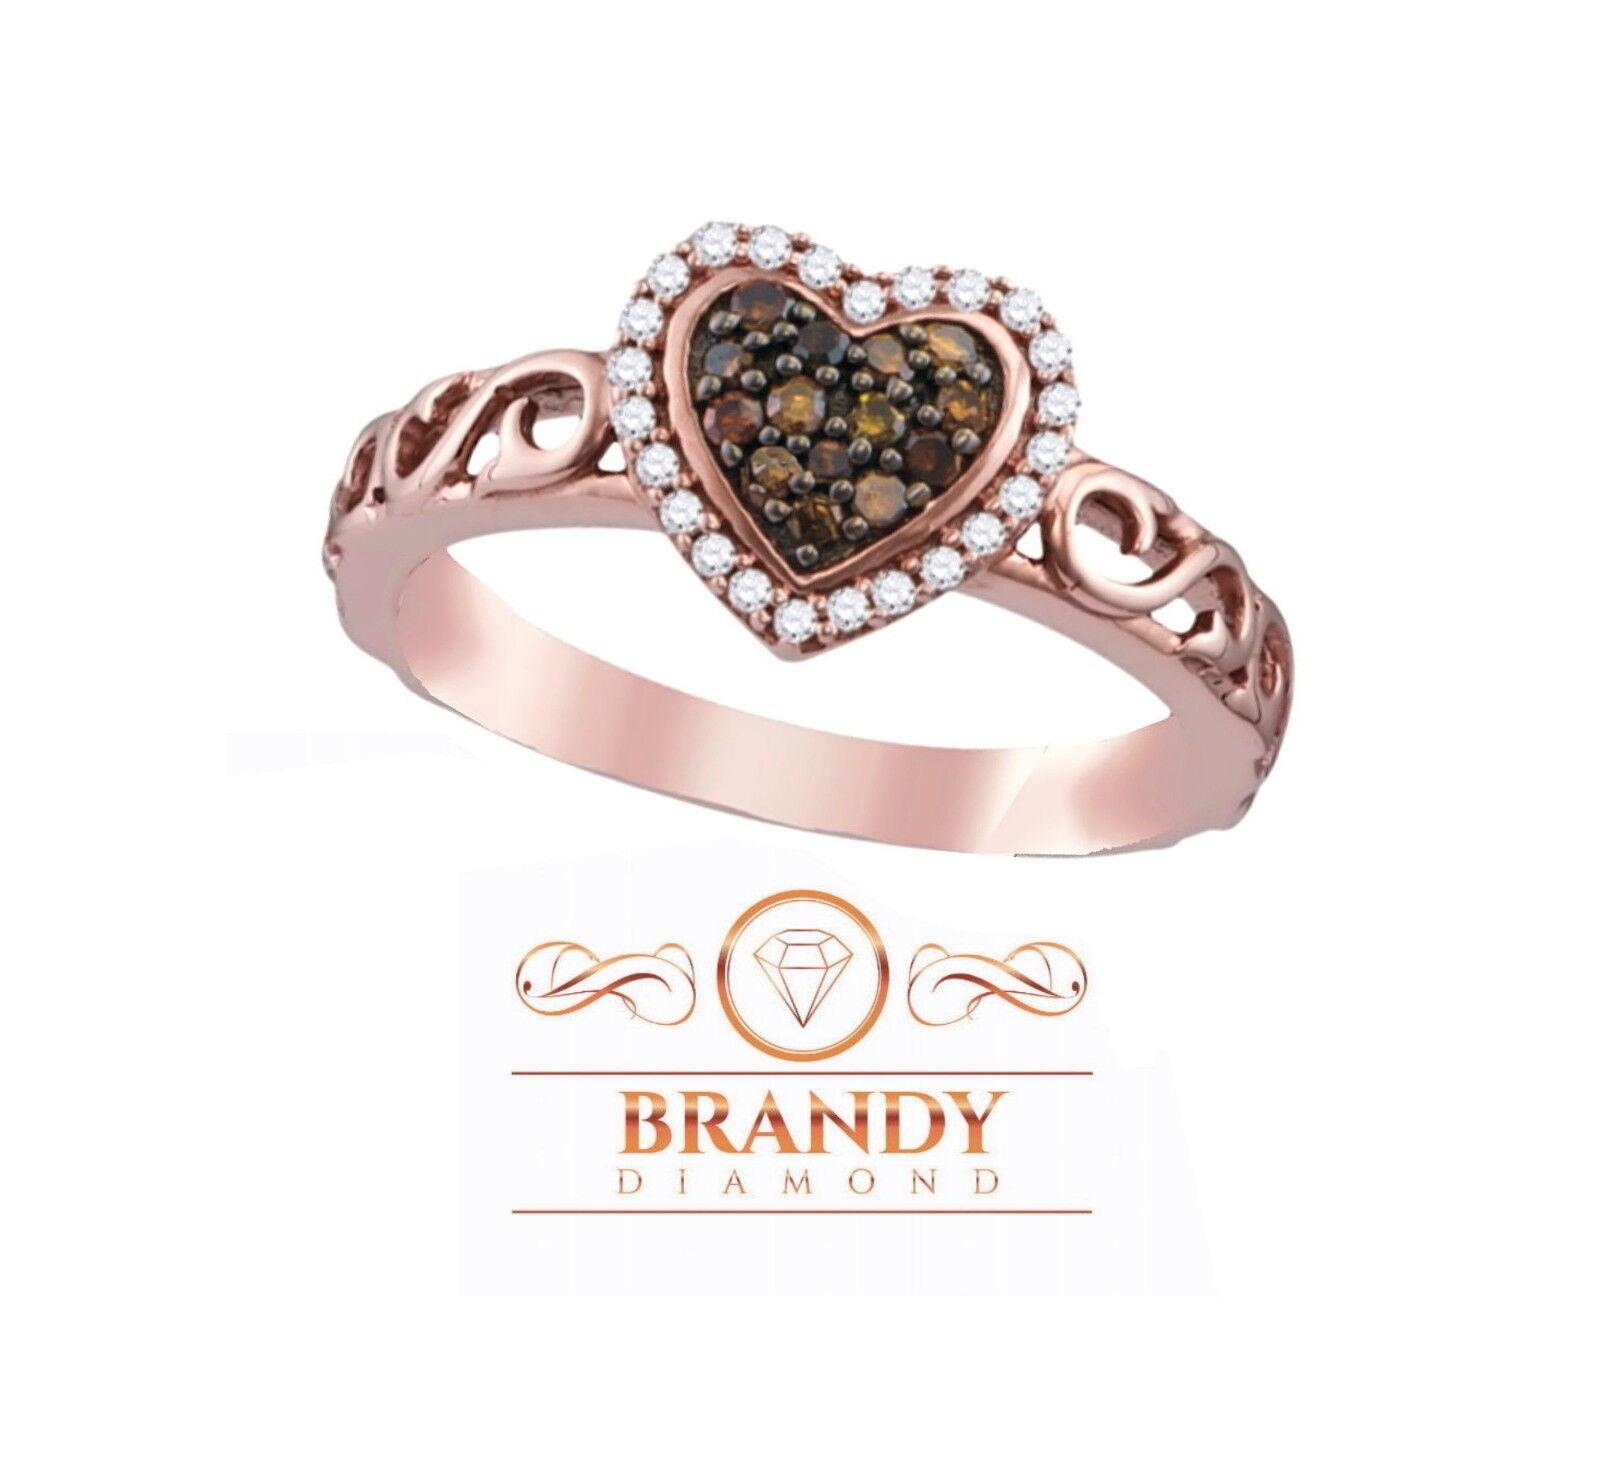 Brandy Diamond Chocolate Brown 18K Rose Gold Silver Always I